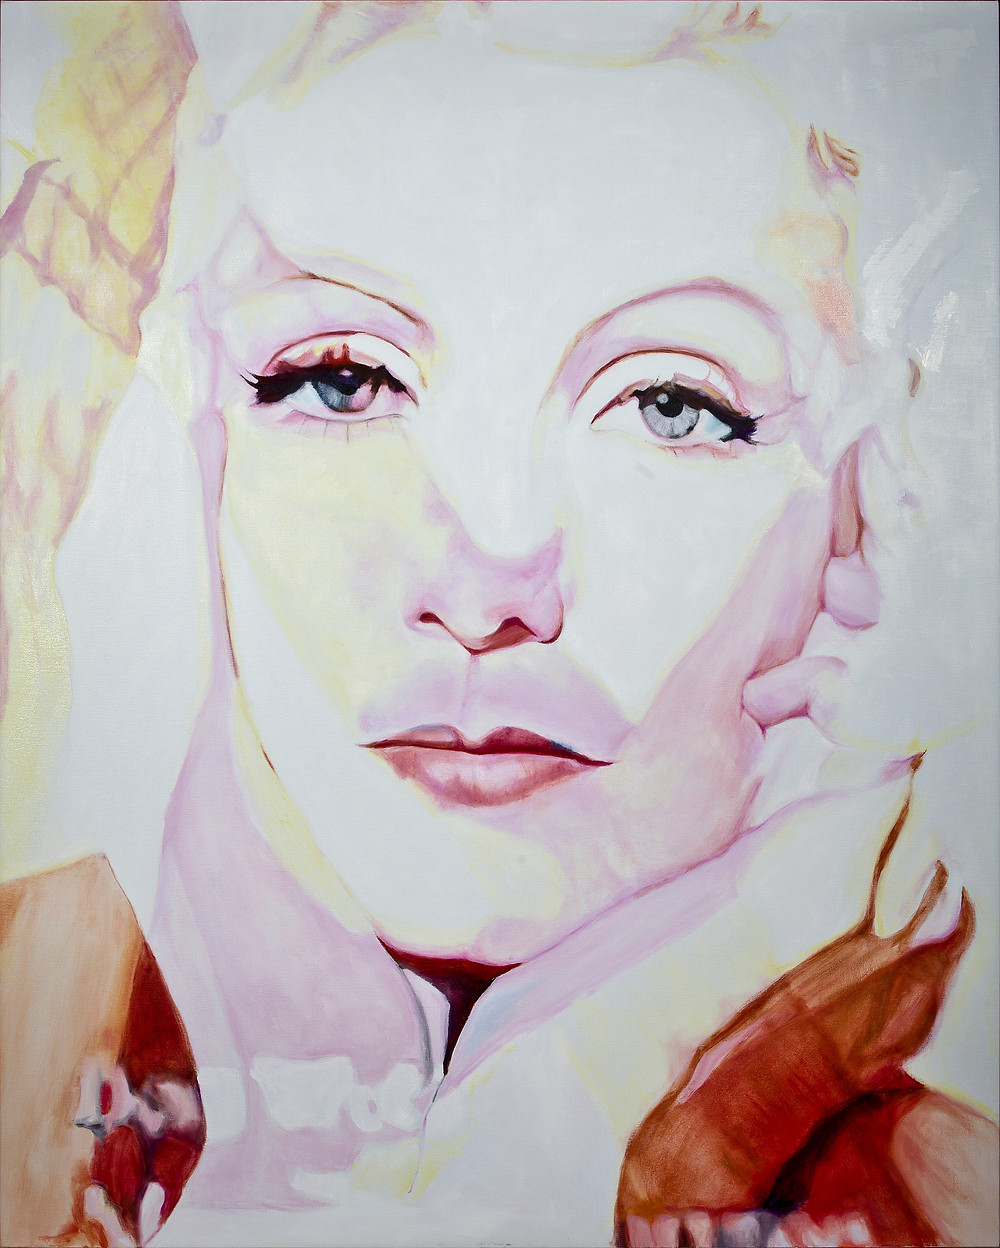 Goddess 3 1600mm x 1300mm Oil on linen canvas Laura Harold